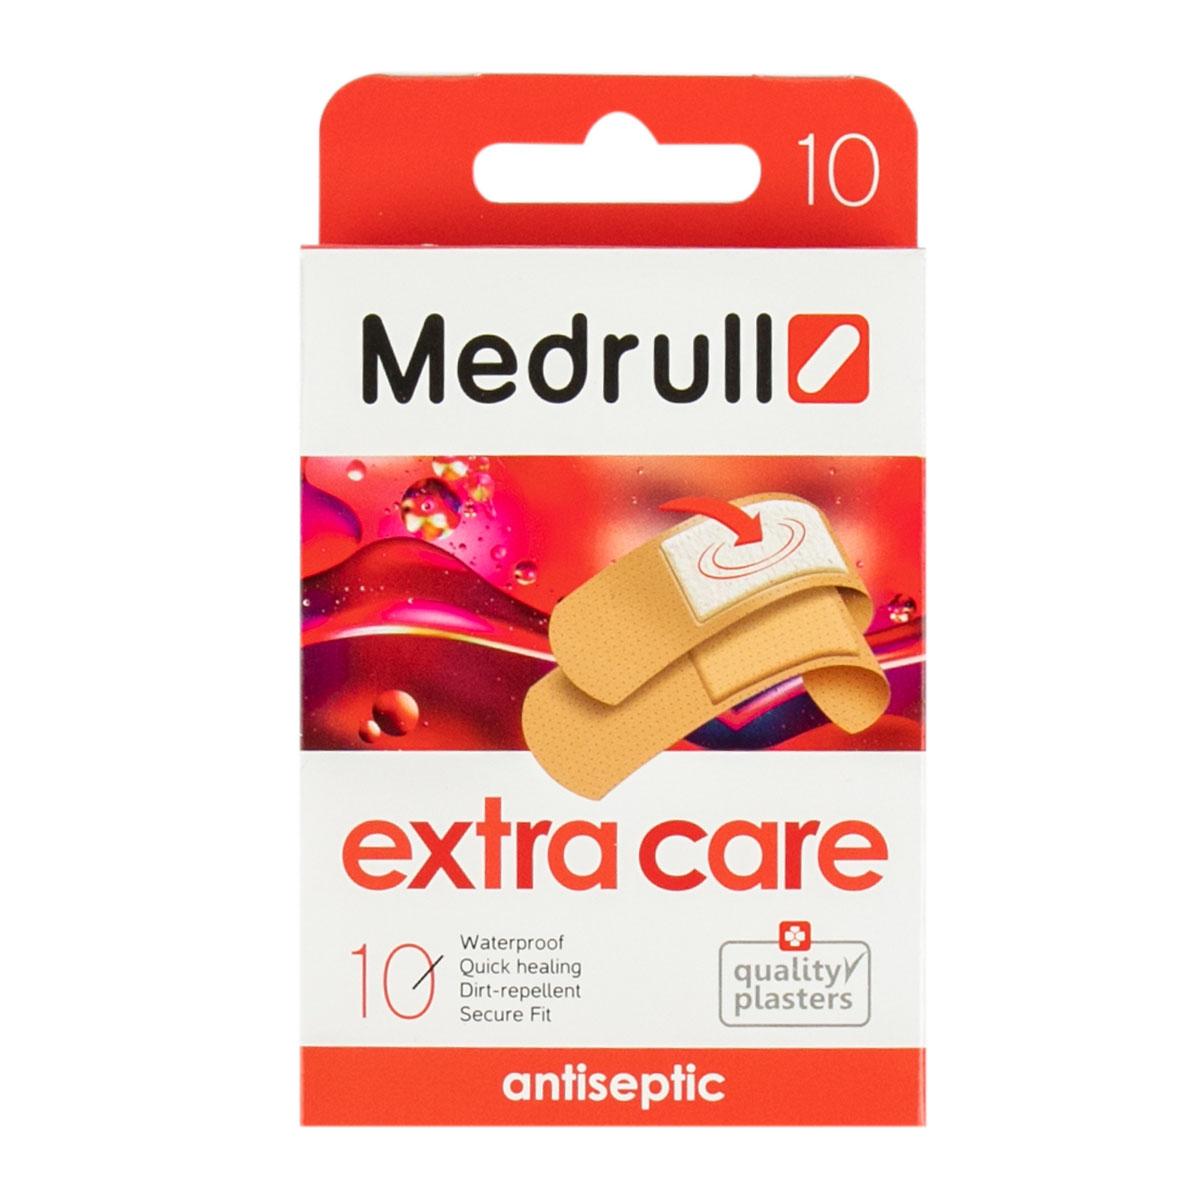 Medrull Extra Care No10